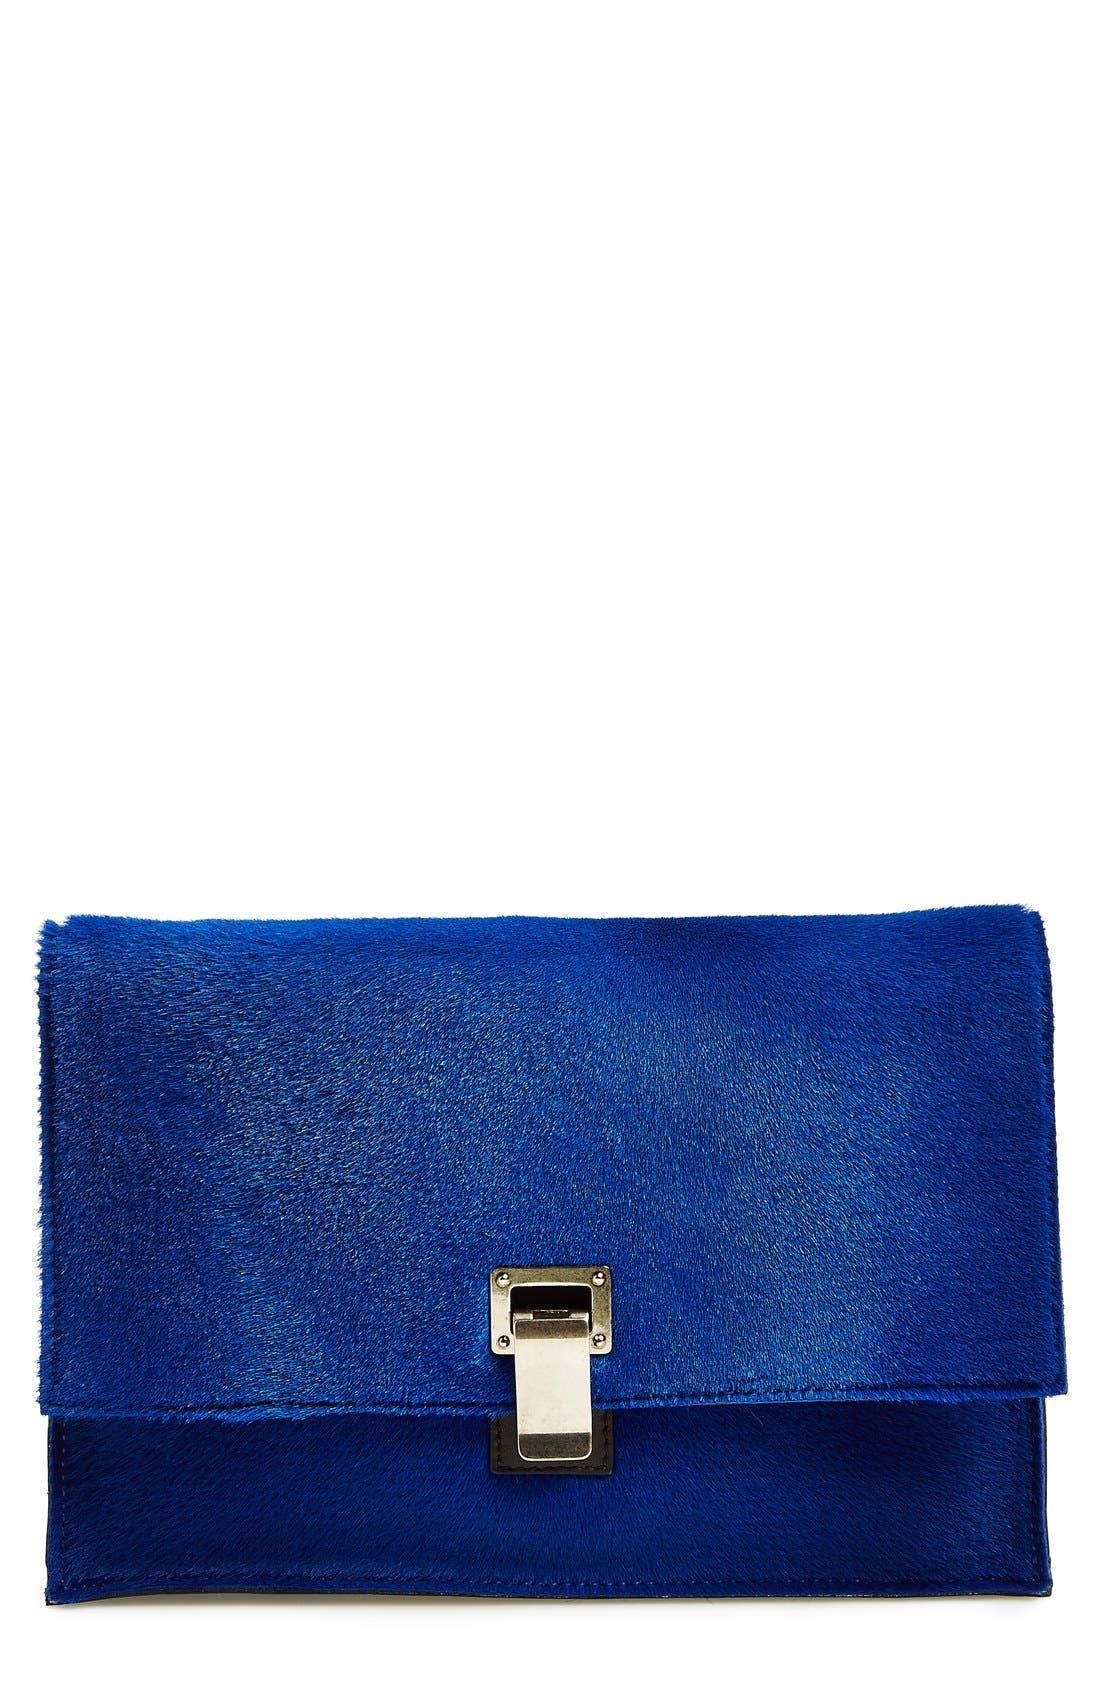 Main Image - Proenza Schouler 'Lunch Bag - Small' Shearling & Leather Clutch